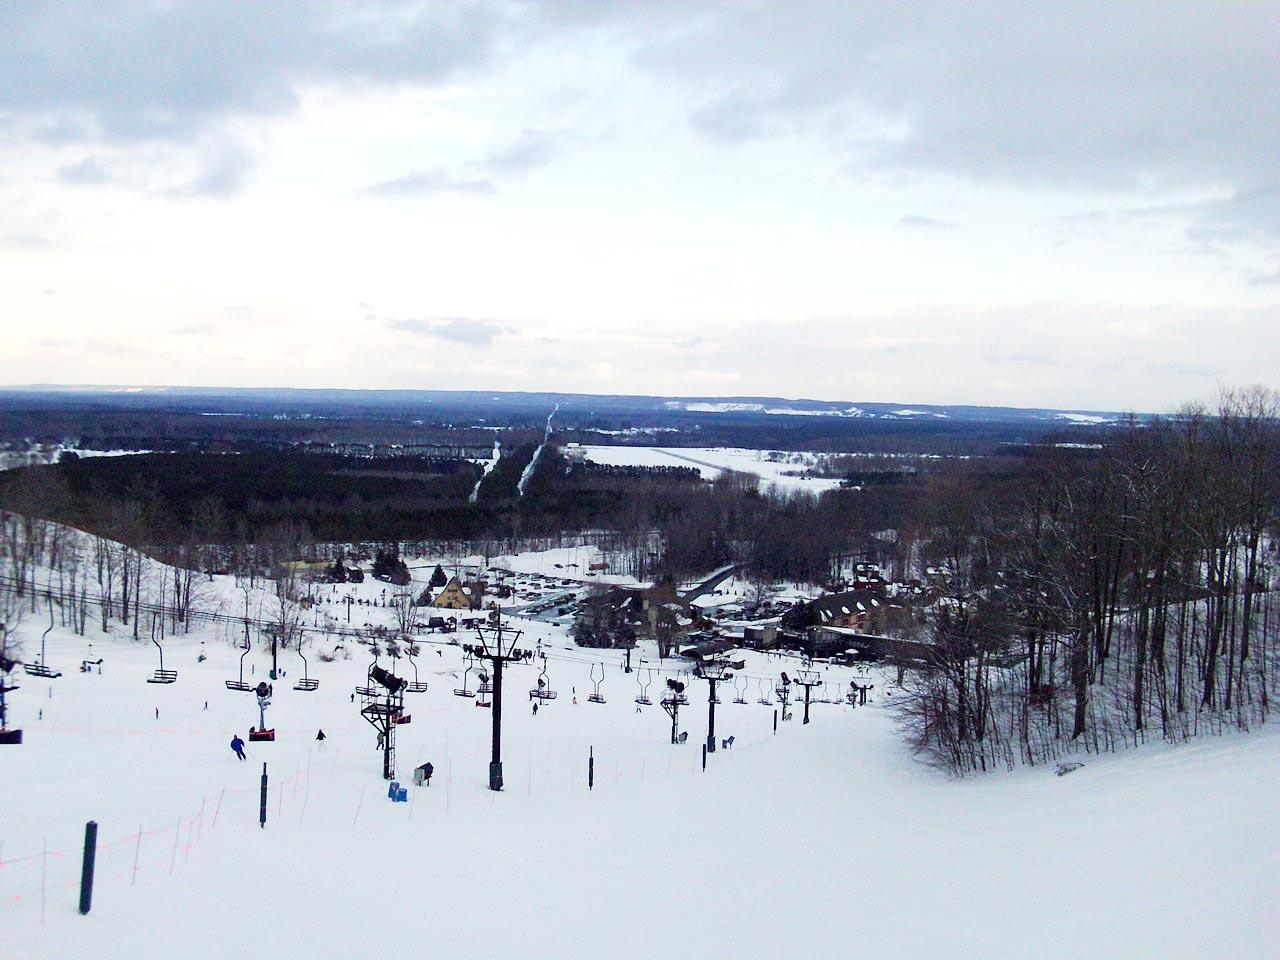 Crystal Mountain - Amazing Ski Resort in Michigan